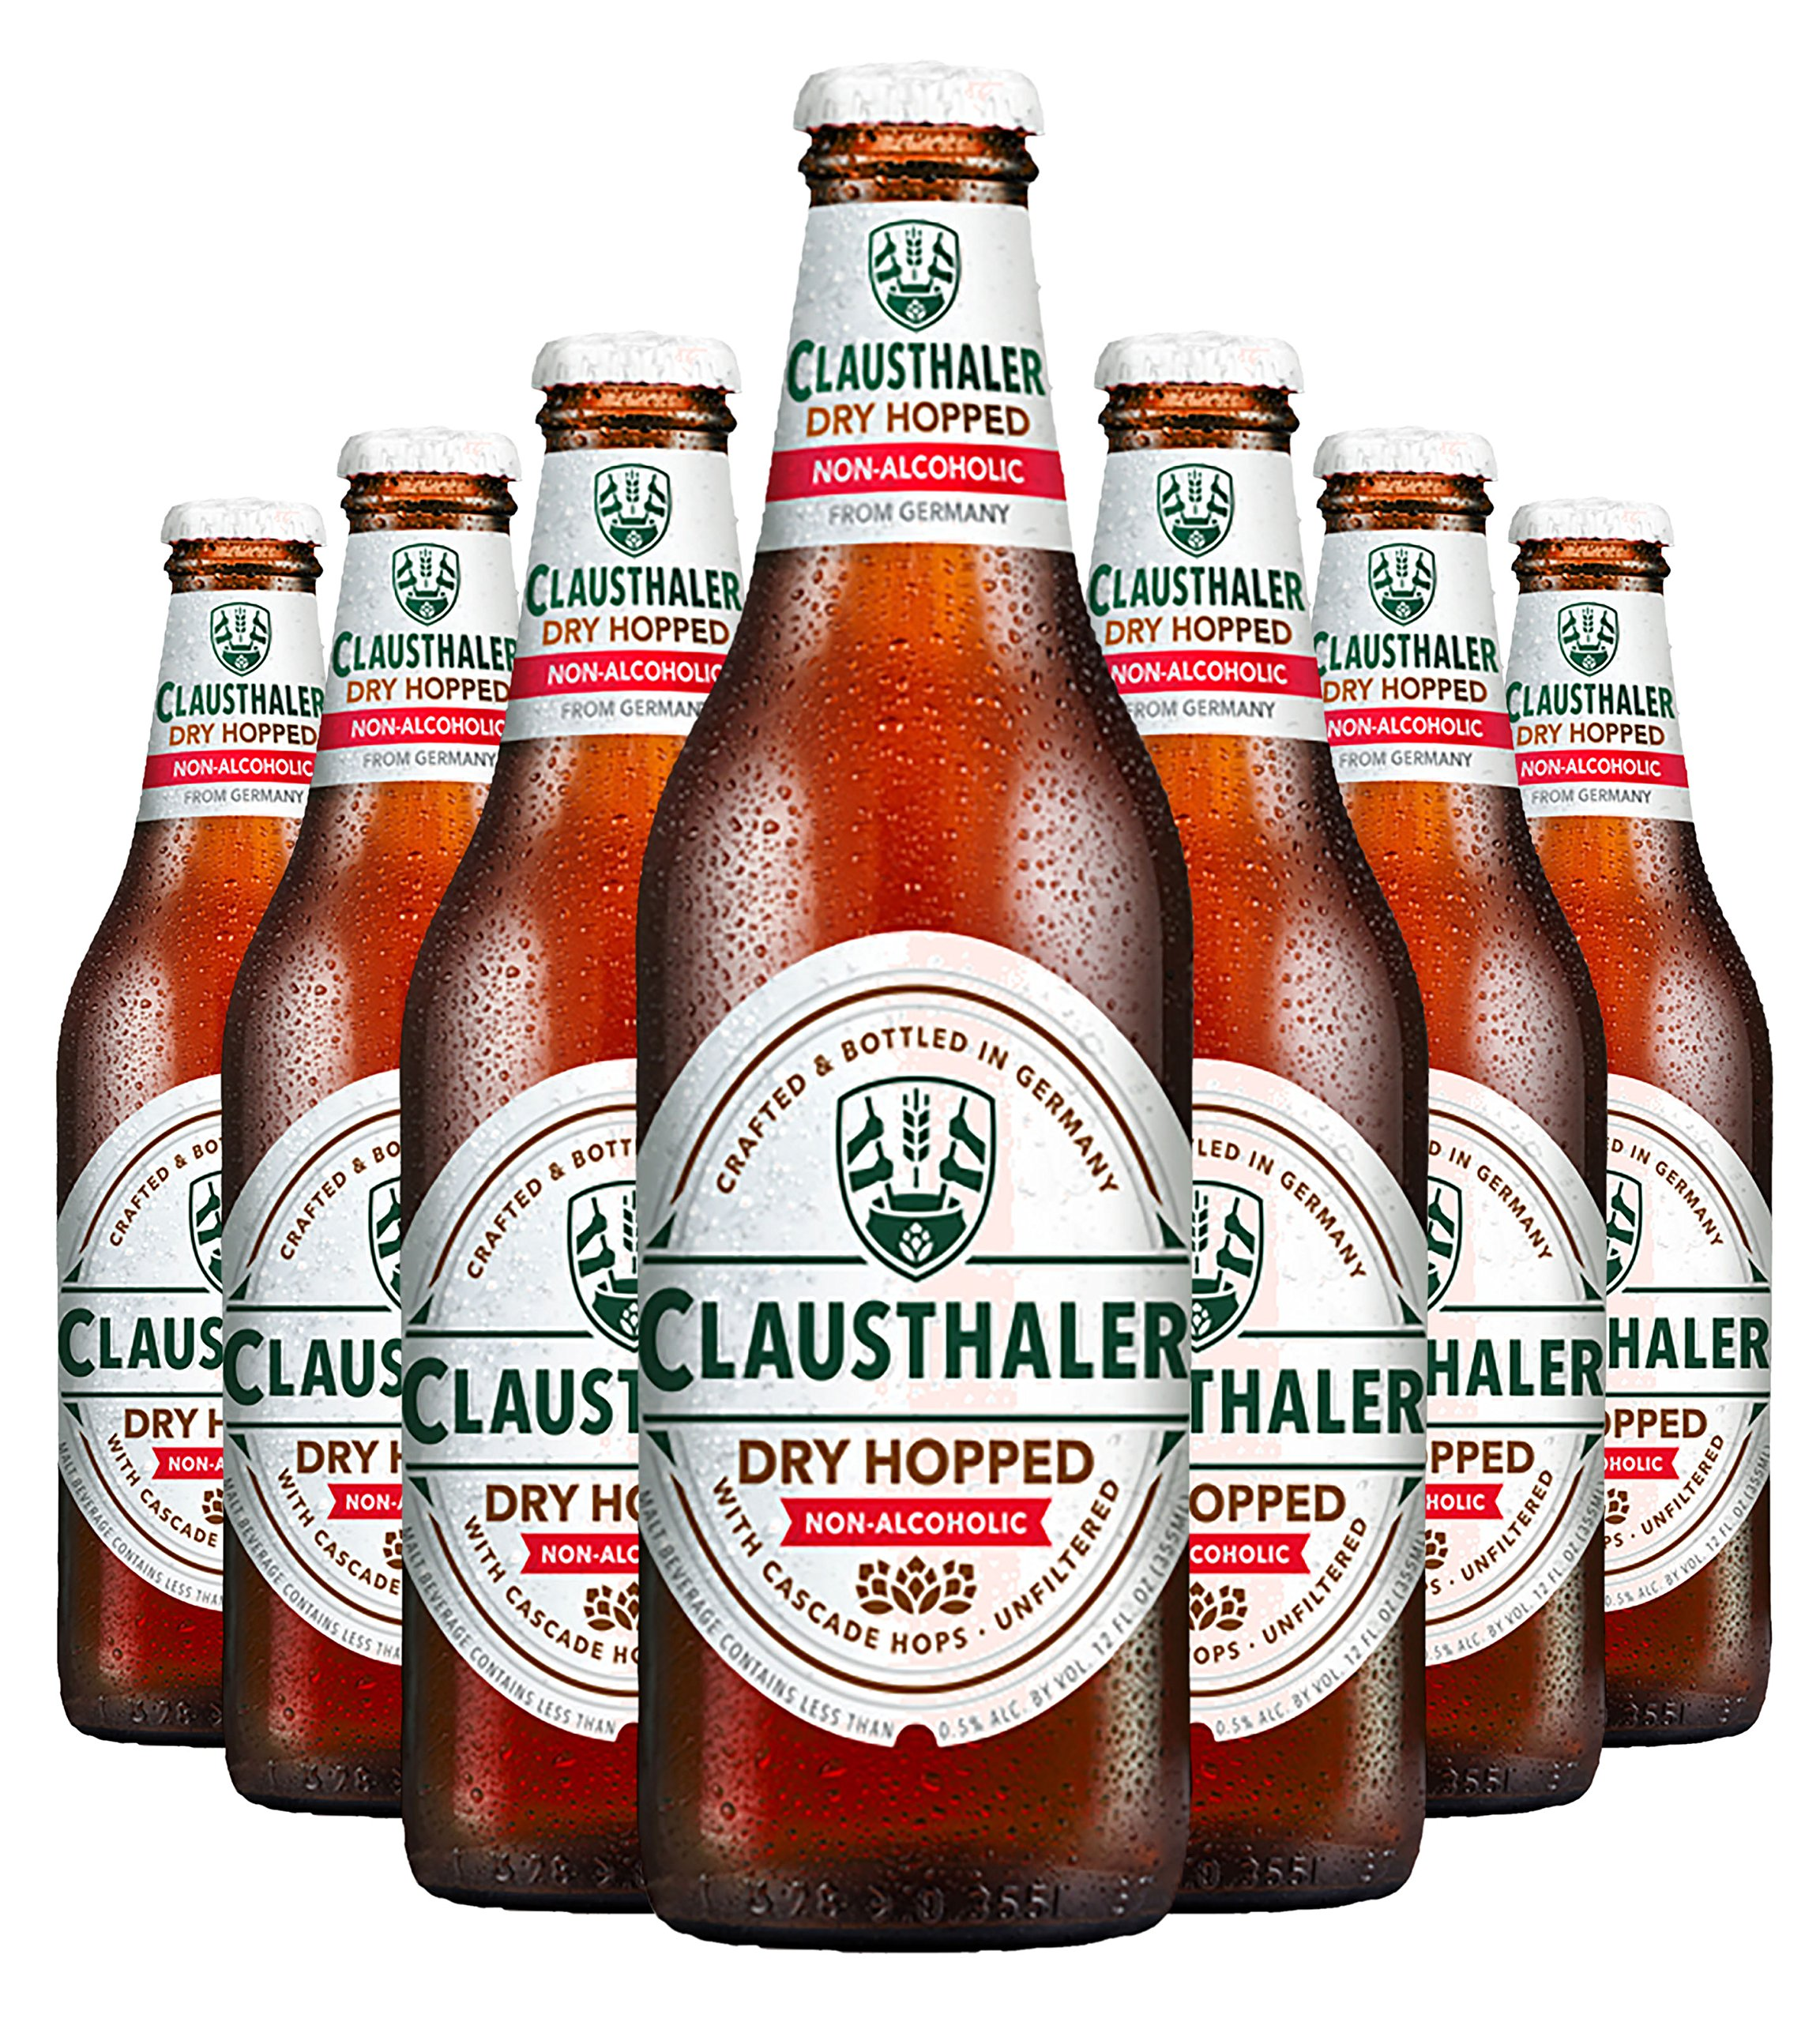 Clausthaler Amber Dry Hopped Non-Alcoholic Beer, 12-oz (350 ml) Case of 12 Glass Bottles